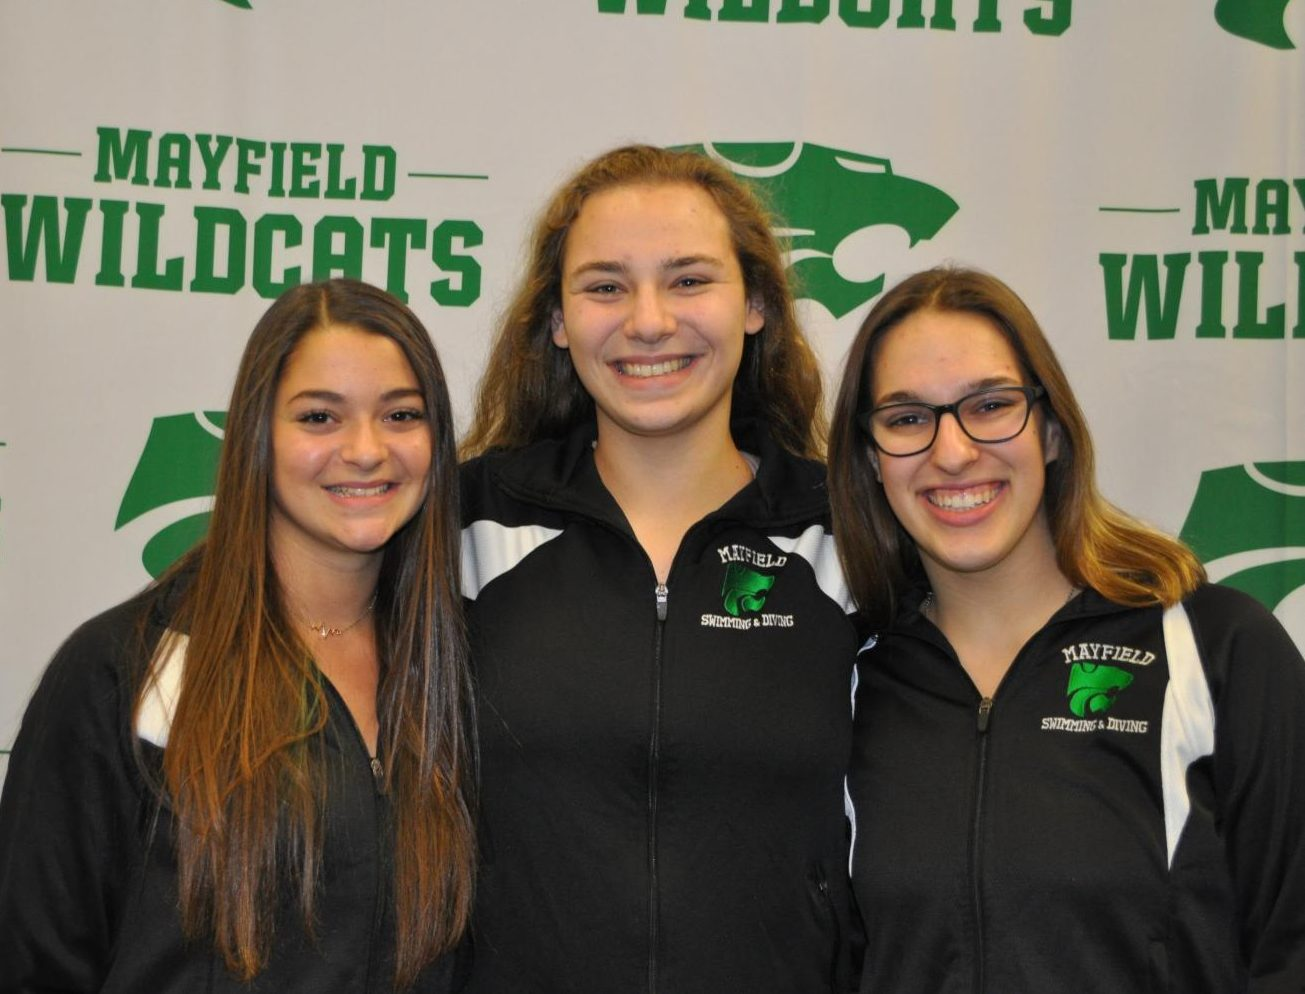 Gianna Ferrante, Karen Argie, and Maria Regas are poised to begin the new swim season.  The three attended Media Day on Friday, Nov. 2 to discuss the upcoming season.